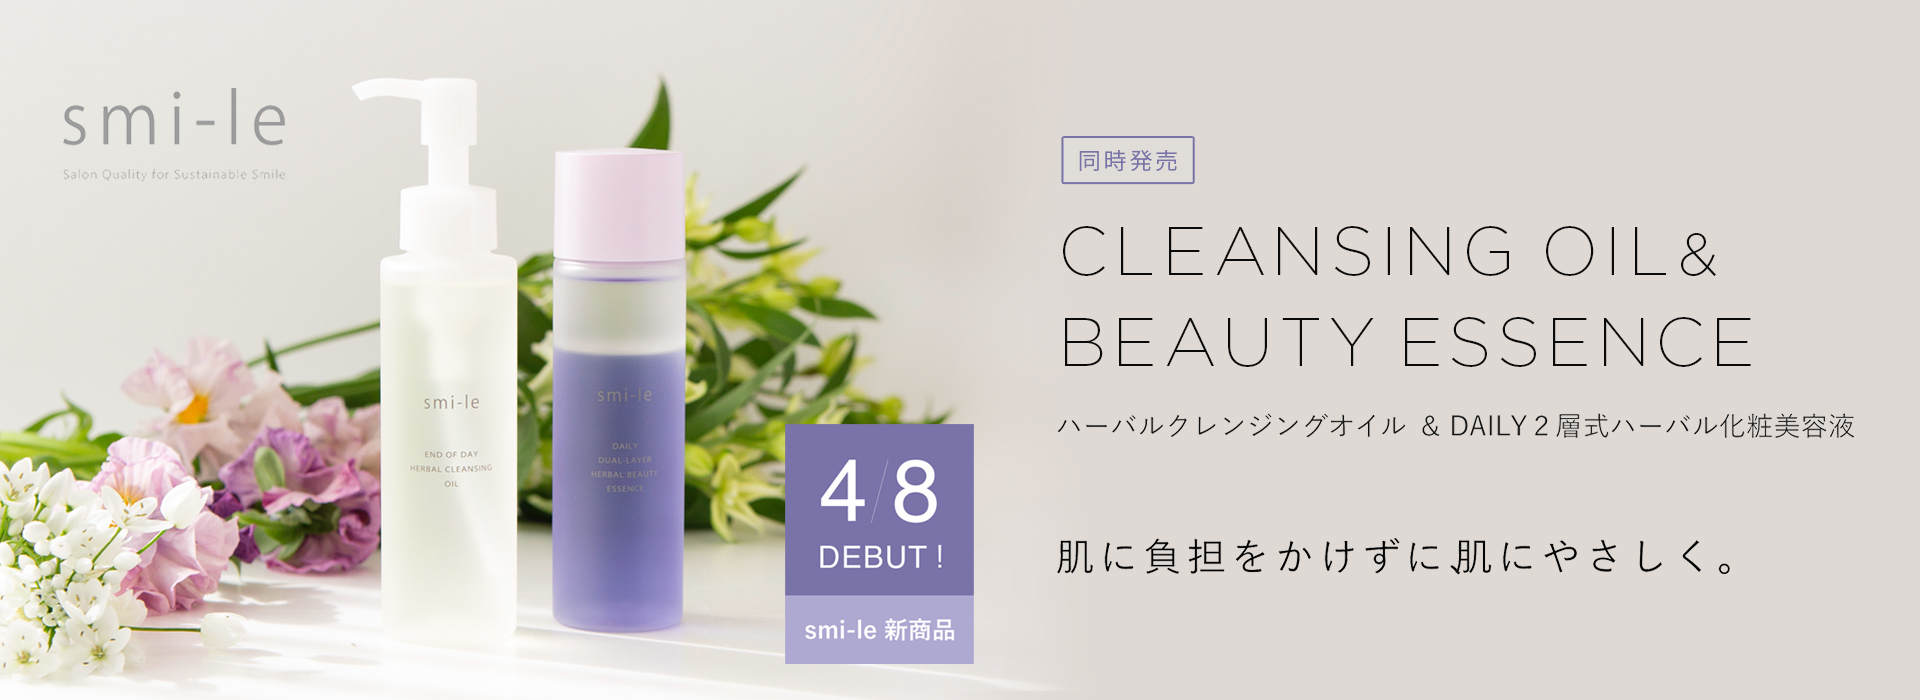 Vセラム発売を記念して、プレミアム特典をご用意しました。